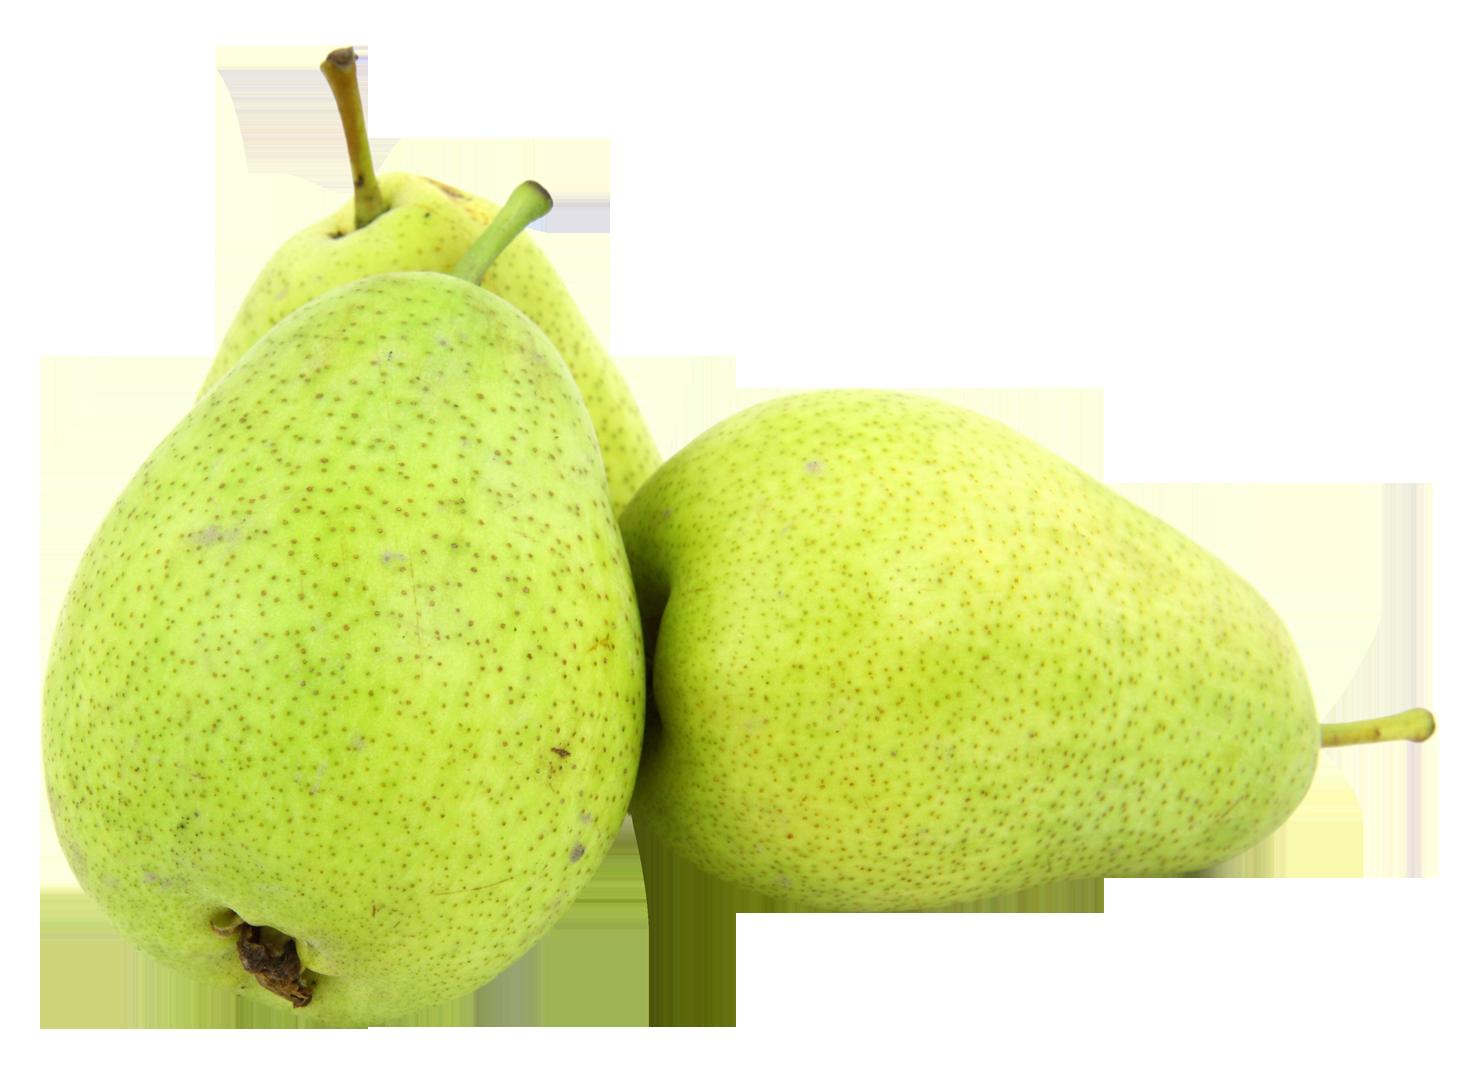 Pear clipart nashpati. Png transparent images free